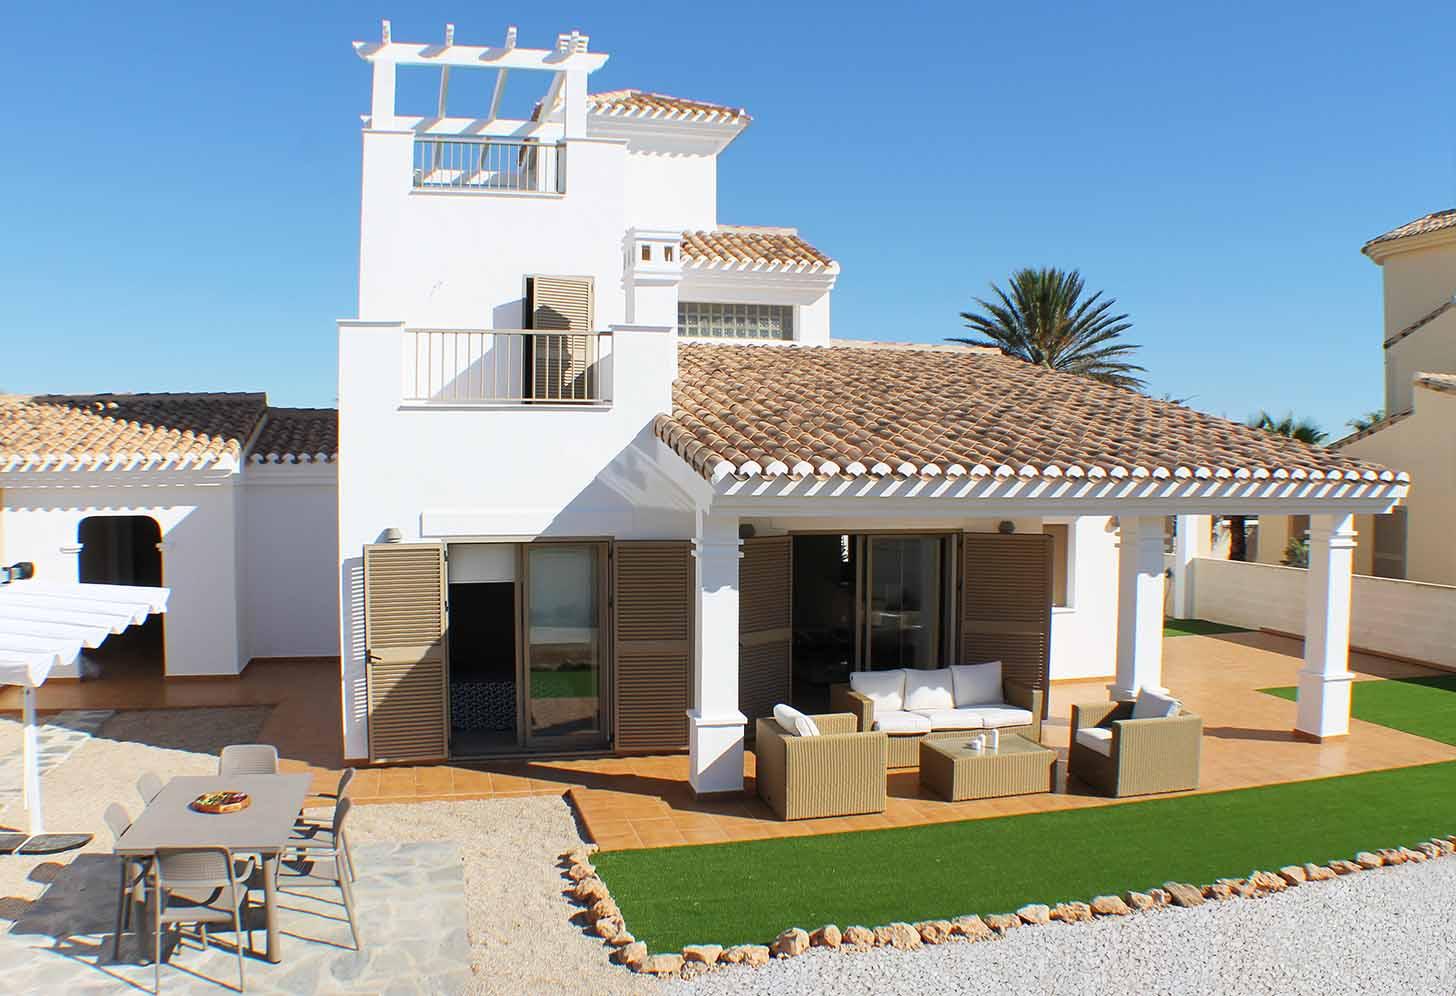 immobilier neuf espagne costa blanca on-d10 la isla villas exterieur